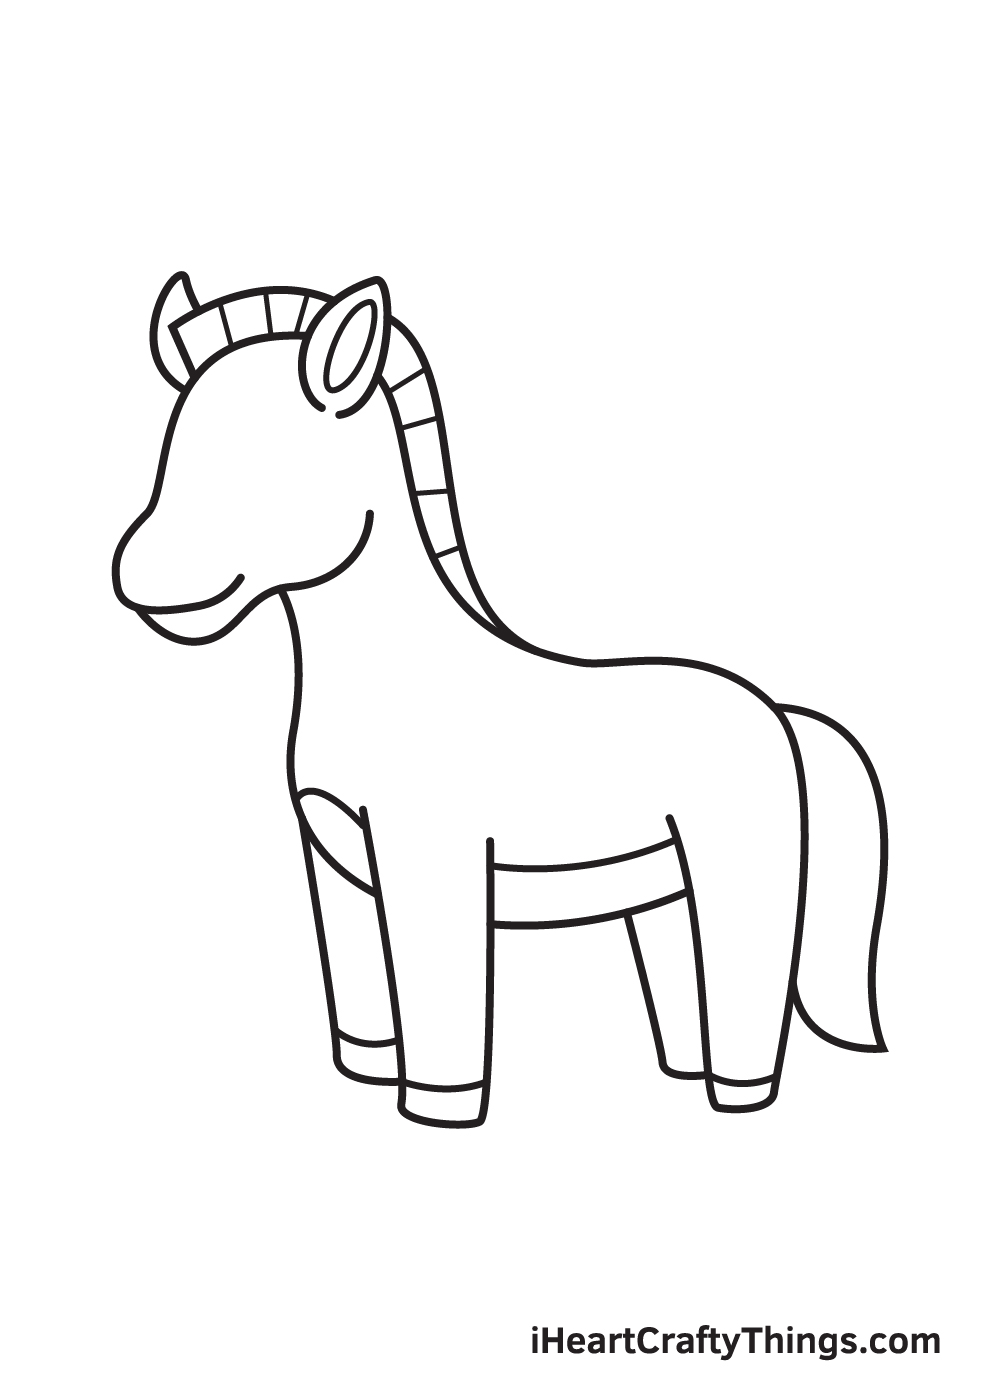 zebra drawing step 8